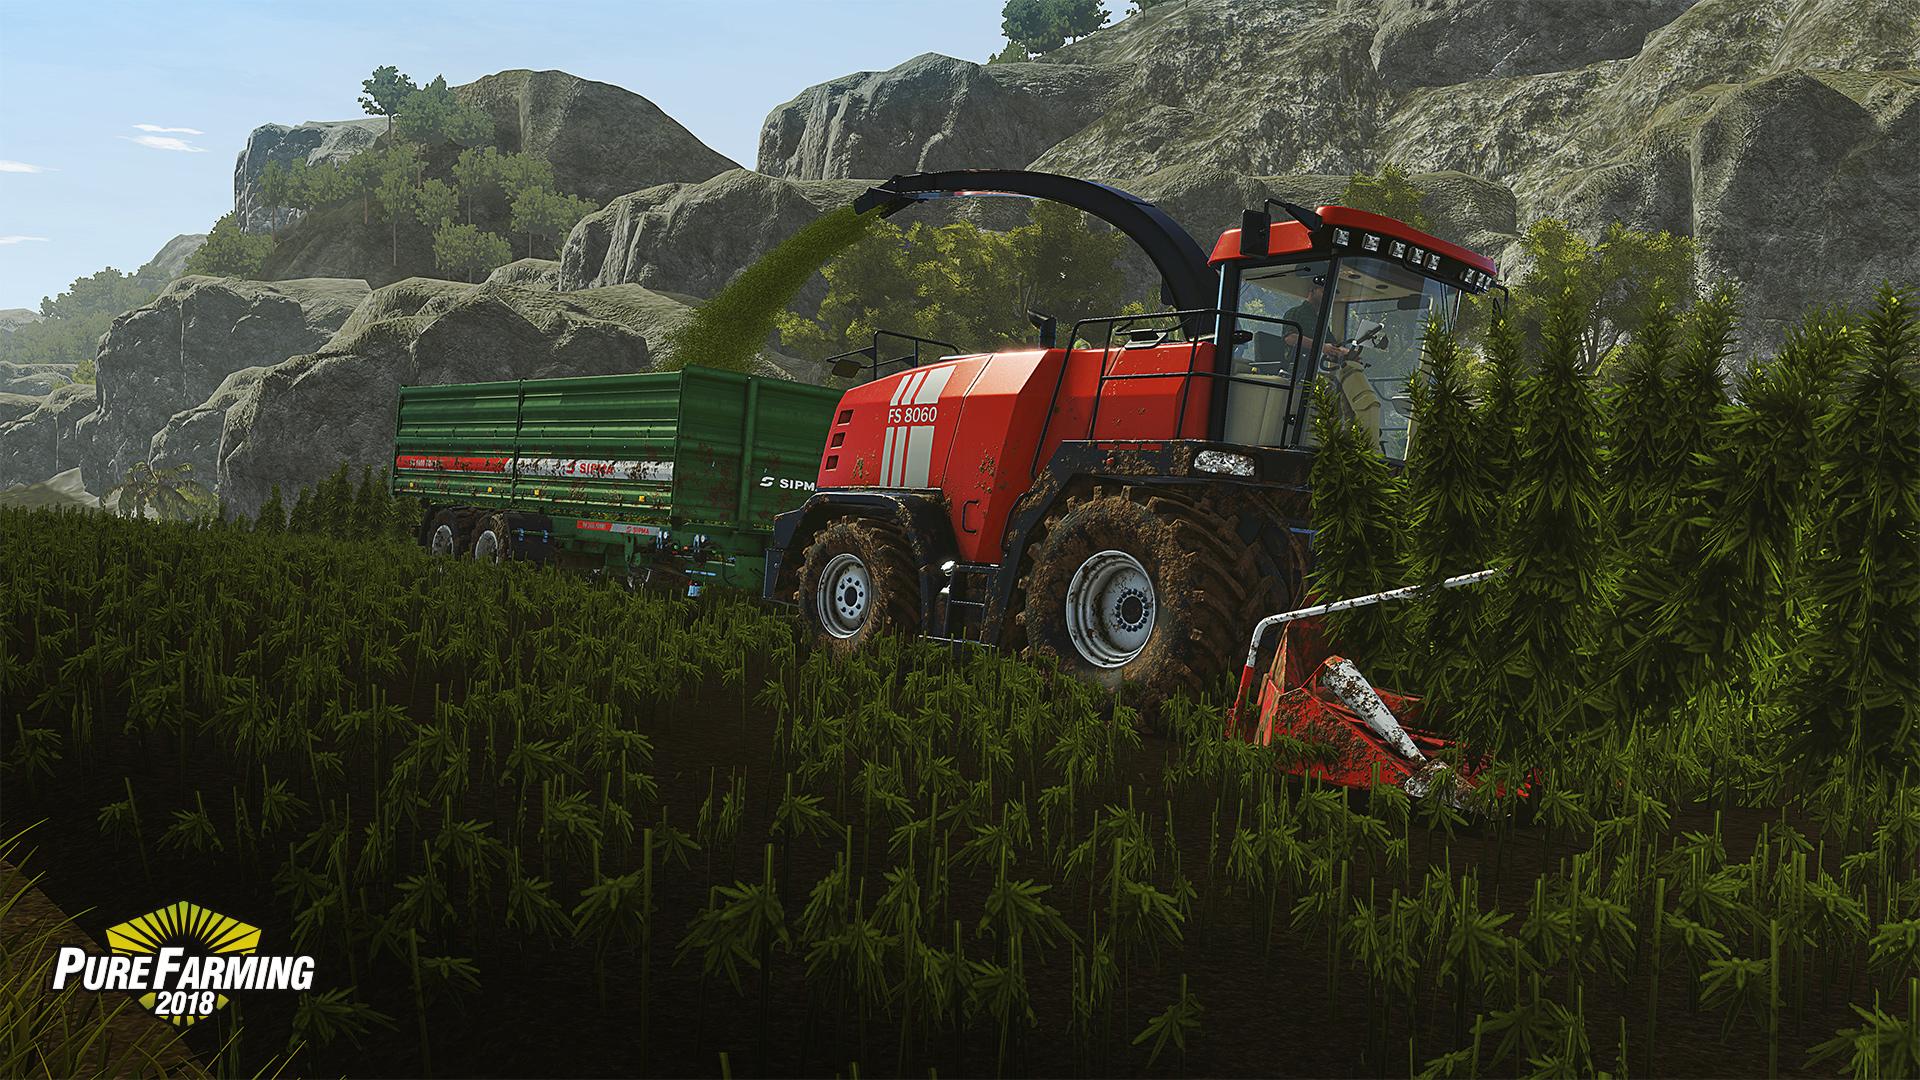 http://www.idgtv.es/archivos/201804/pure-farming-2018-img1.jpg